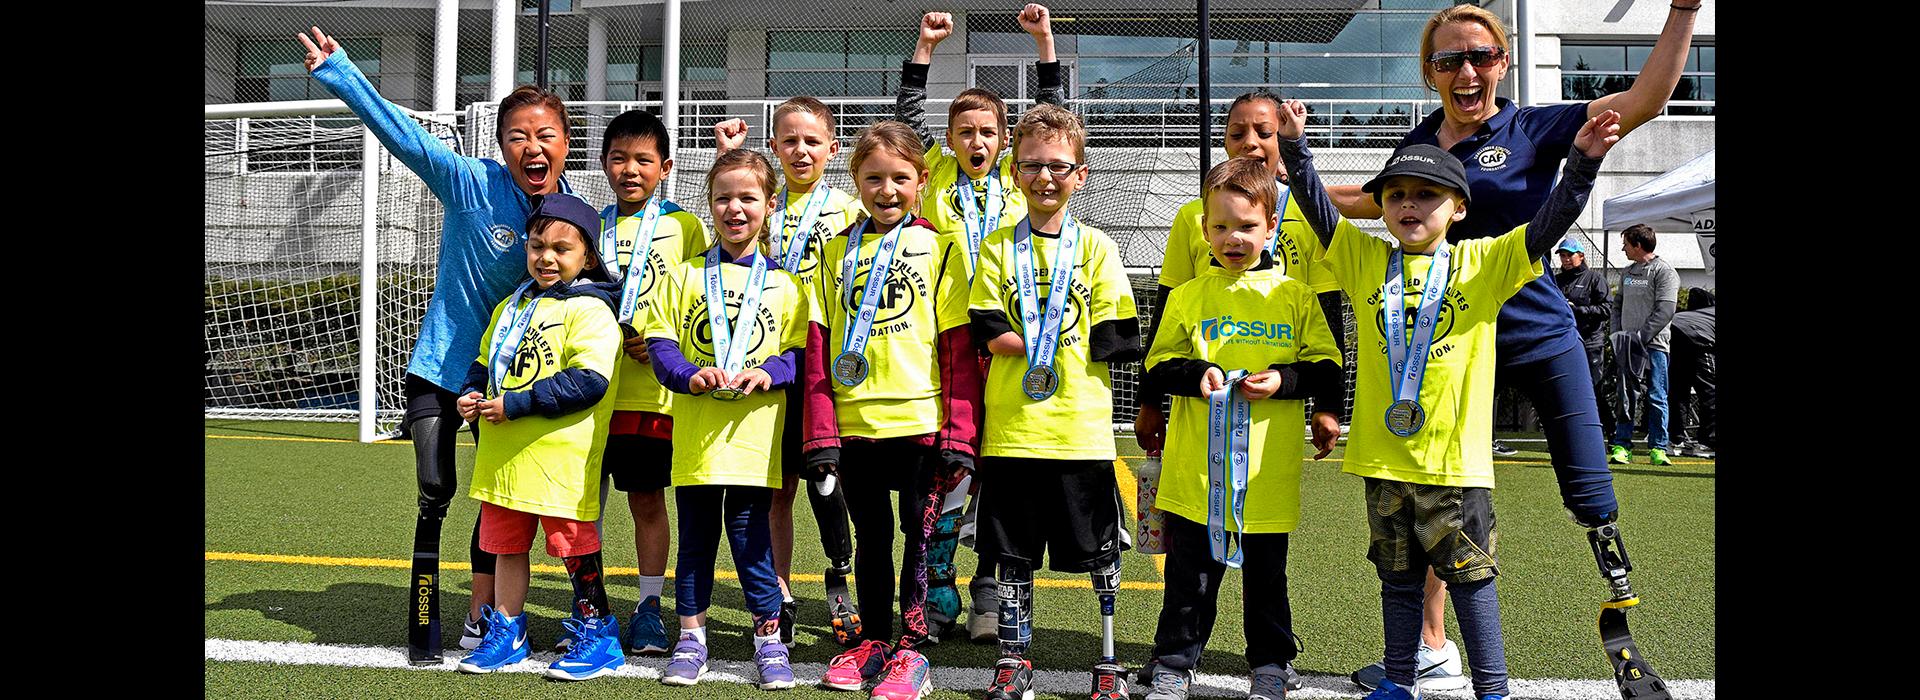 2018 Team Caf Athletes_Grant Funding